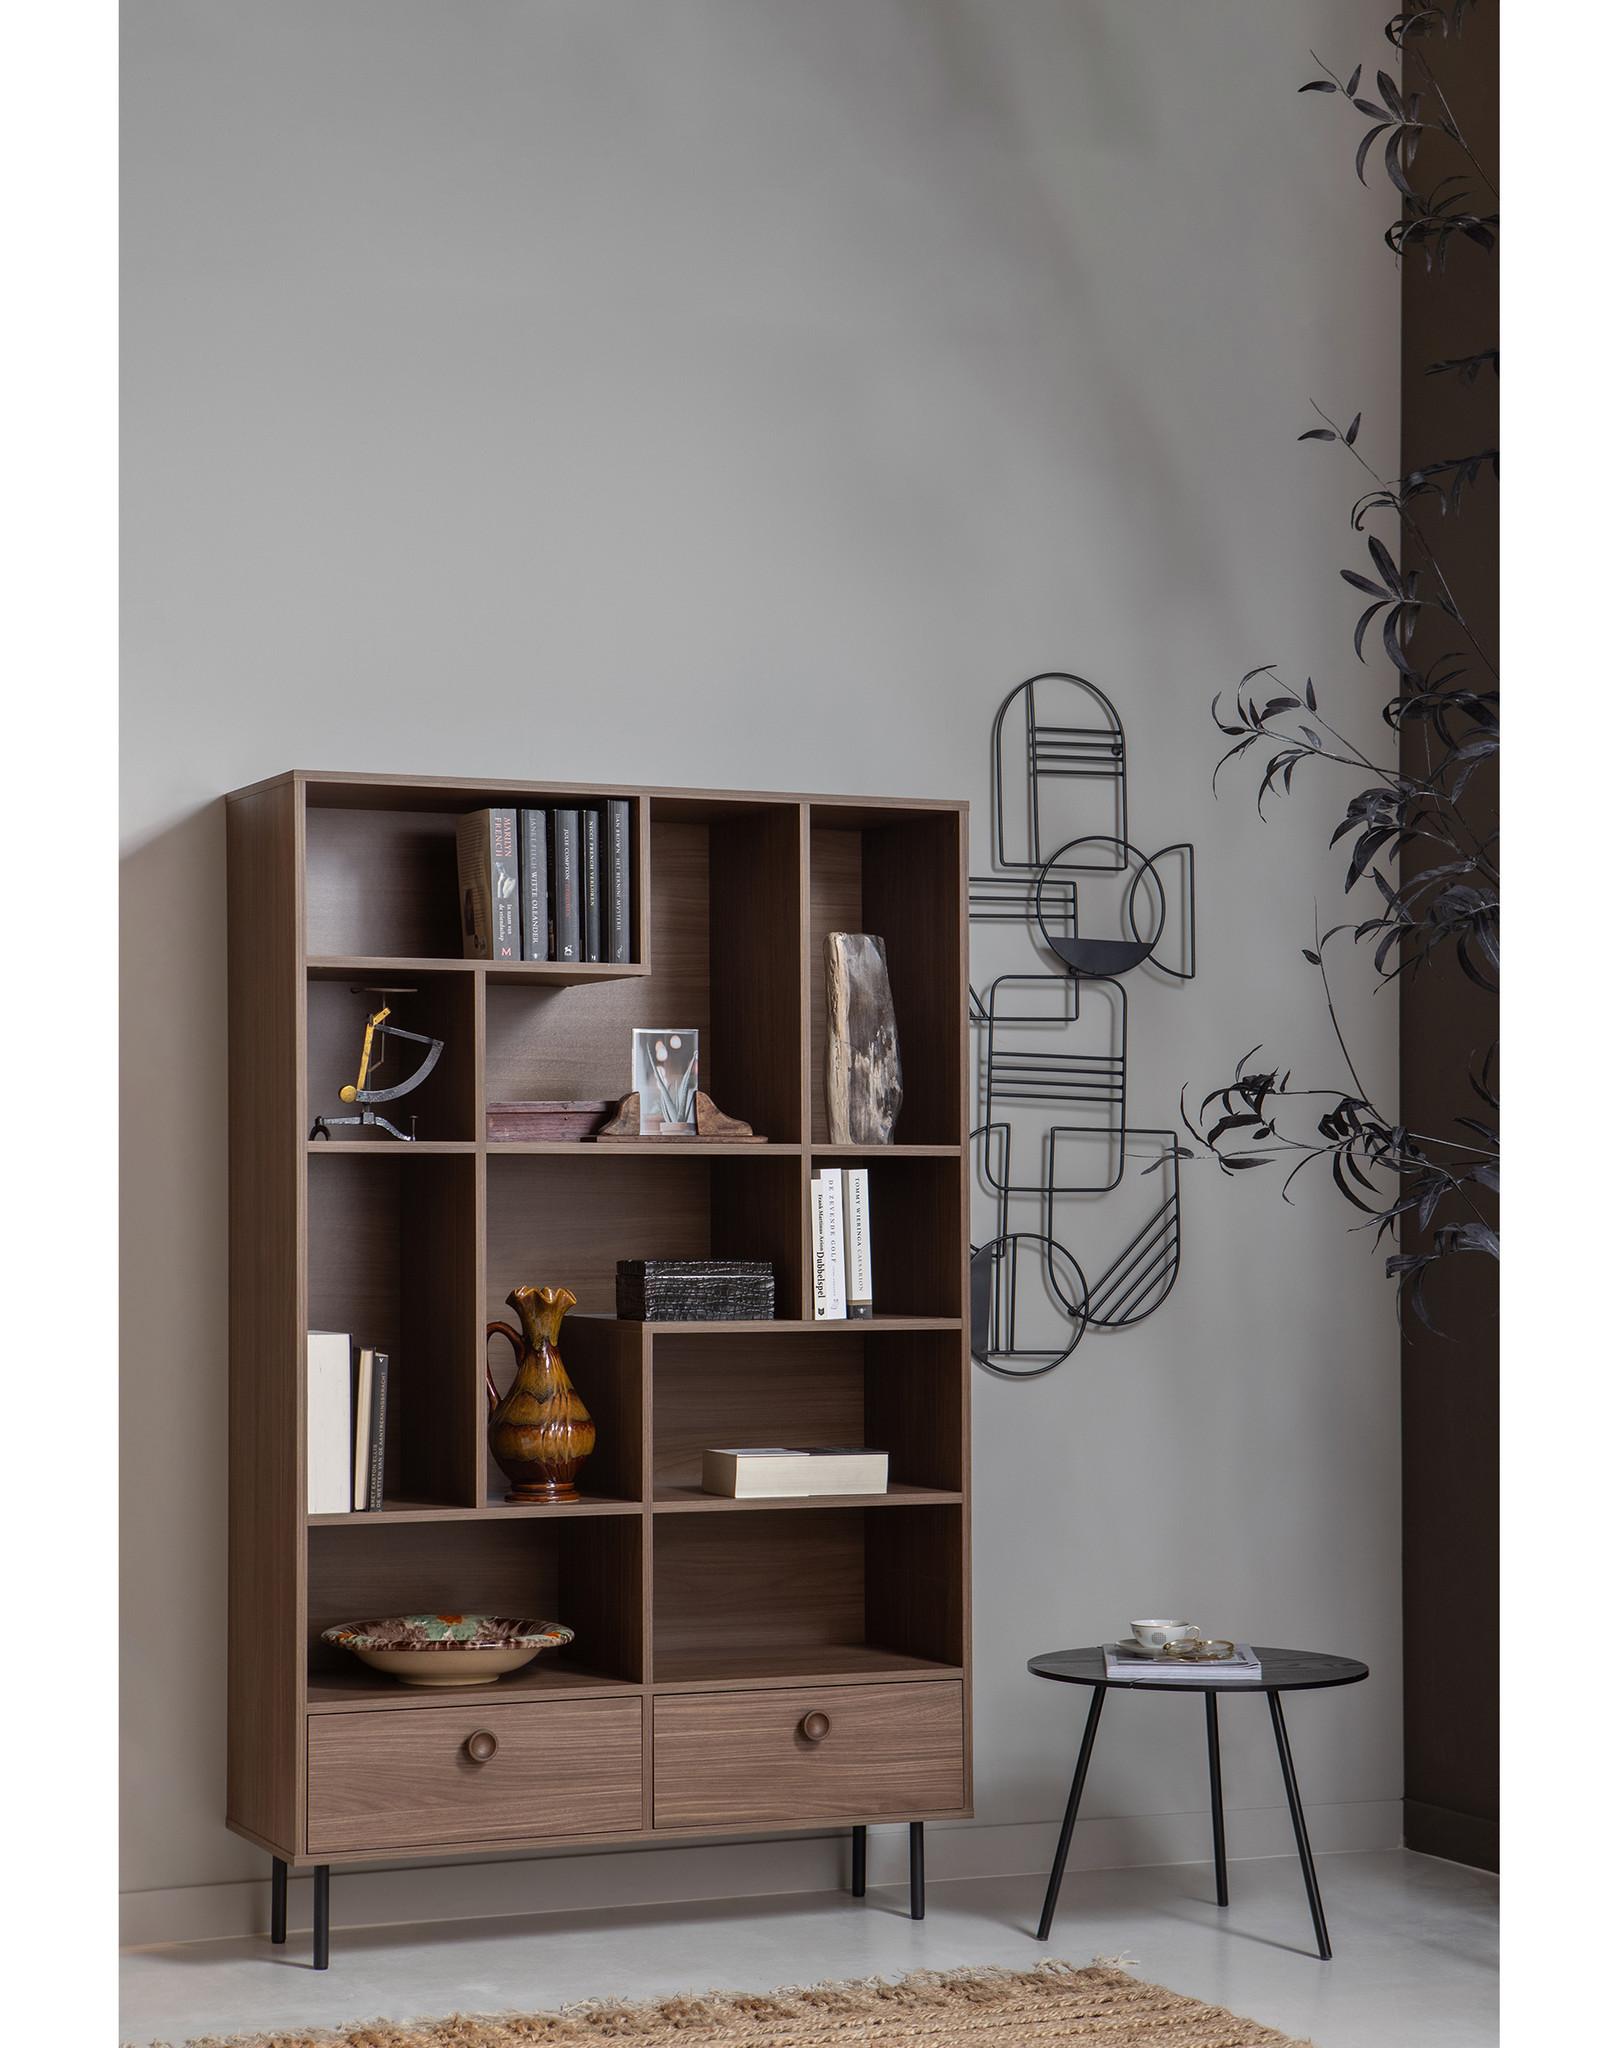 Wandkast walnoot - diepte 35 cm